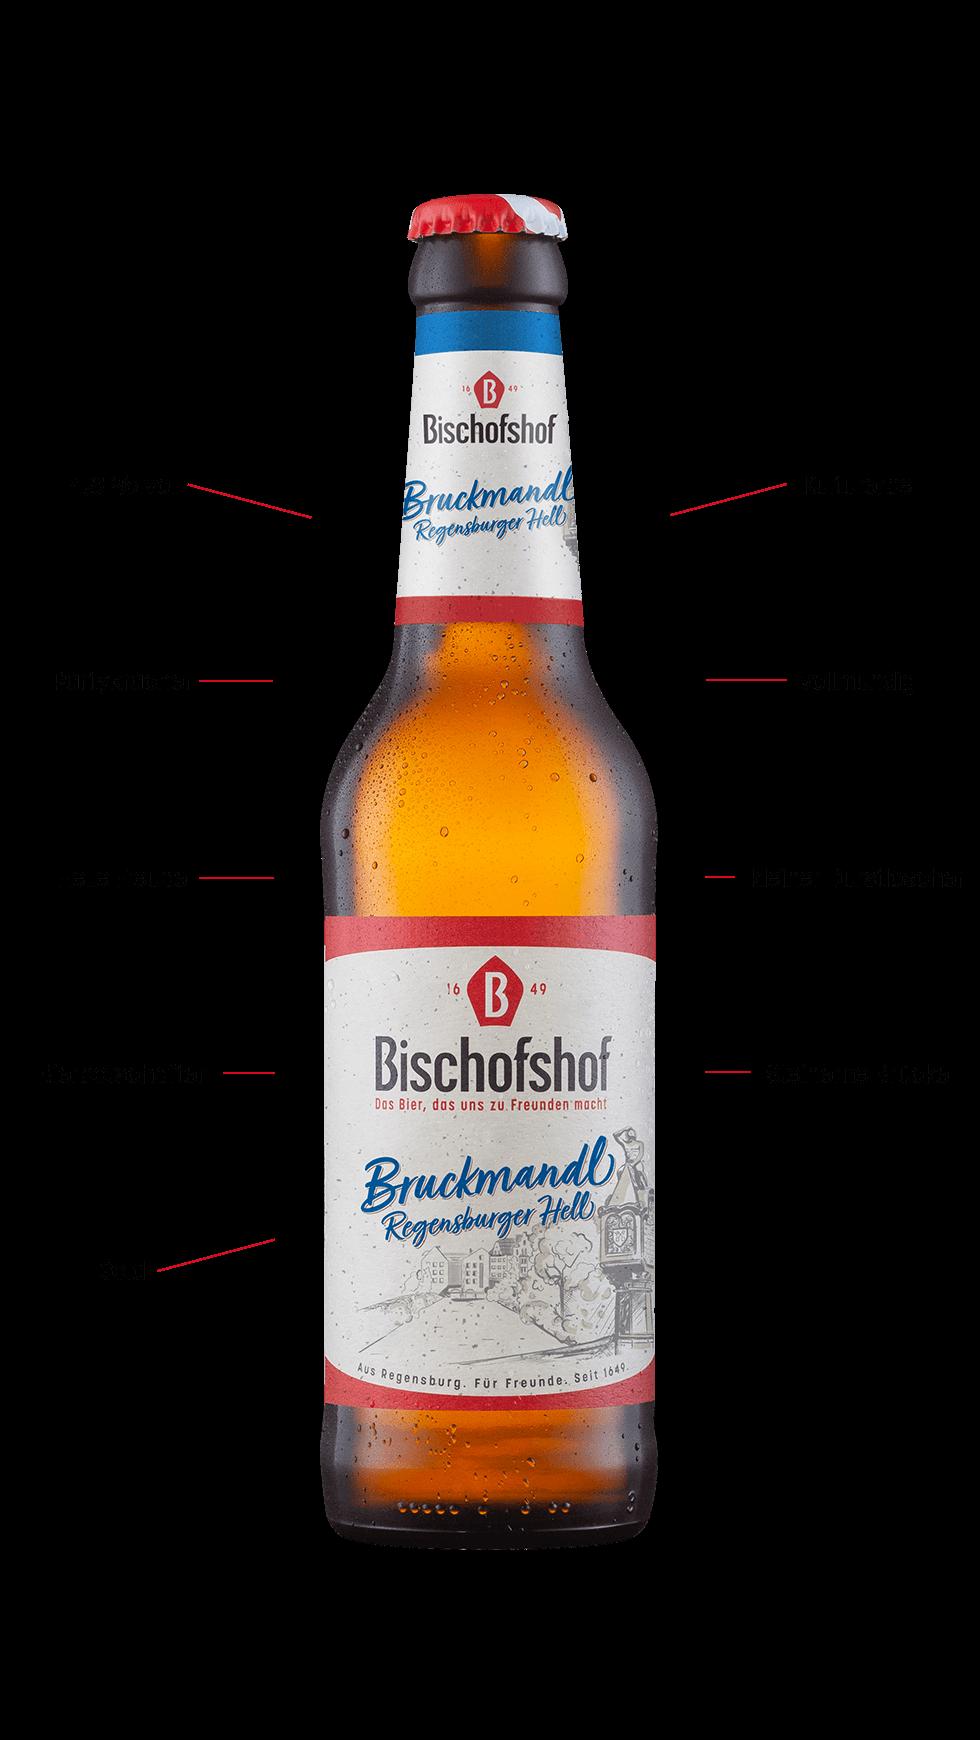 Bischofshof-Regensburger-Bruckmandl-0-33l_ManhartMedia_Schlagwoerter_02